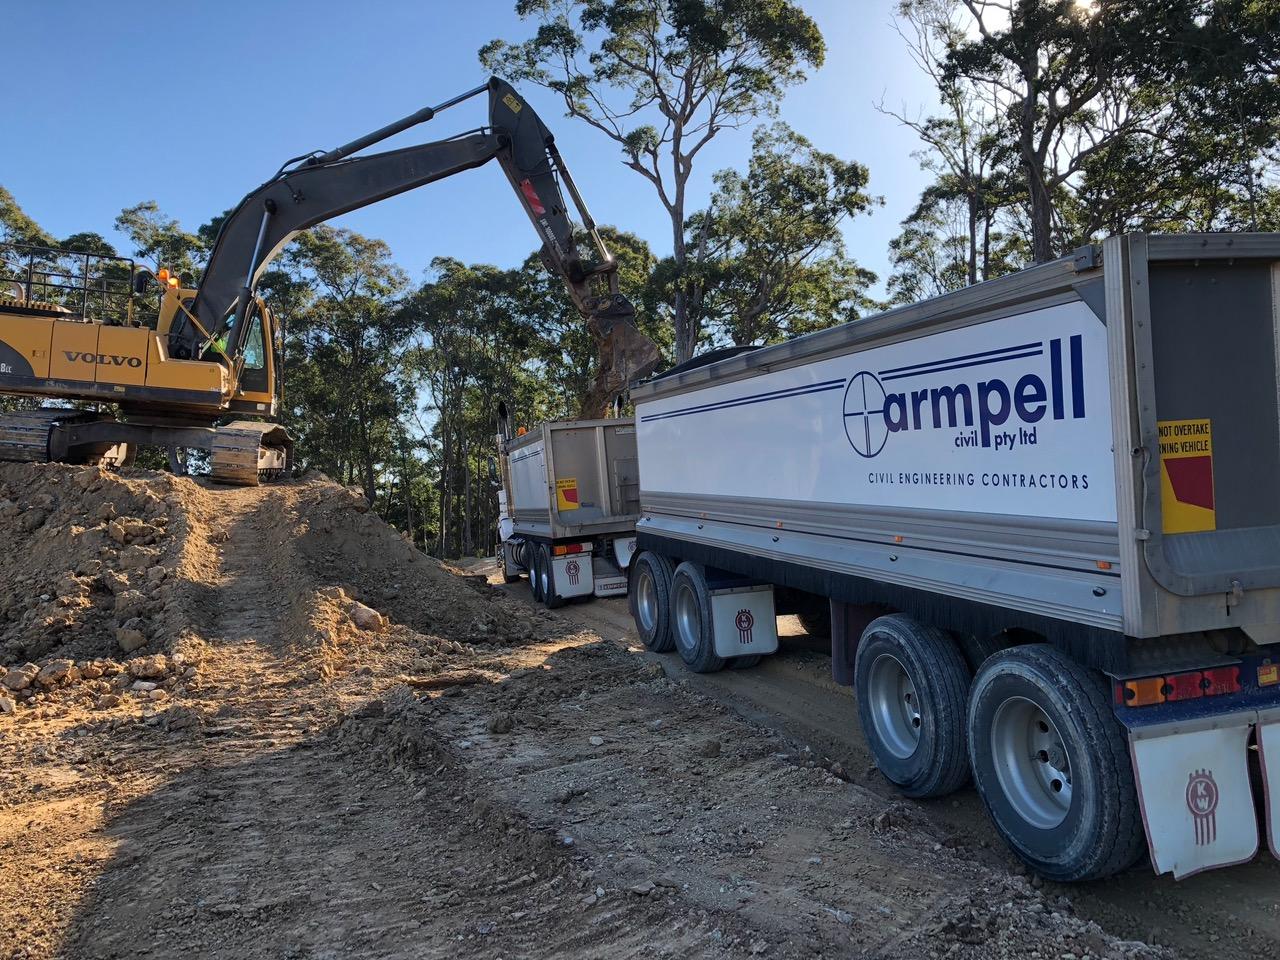 Armprell-Civil-plant-hire